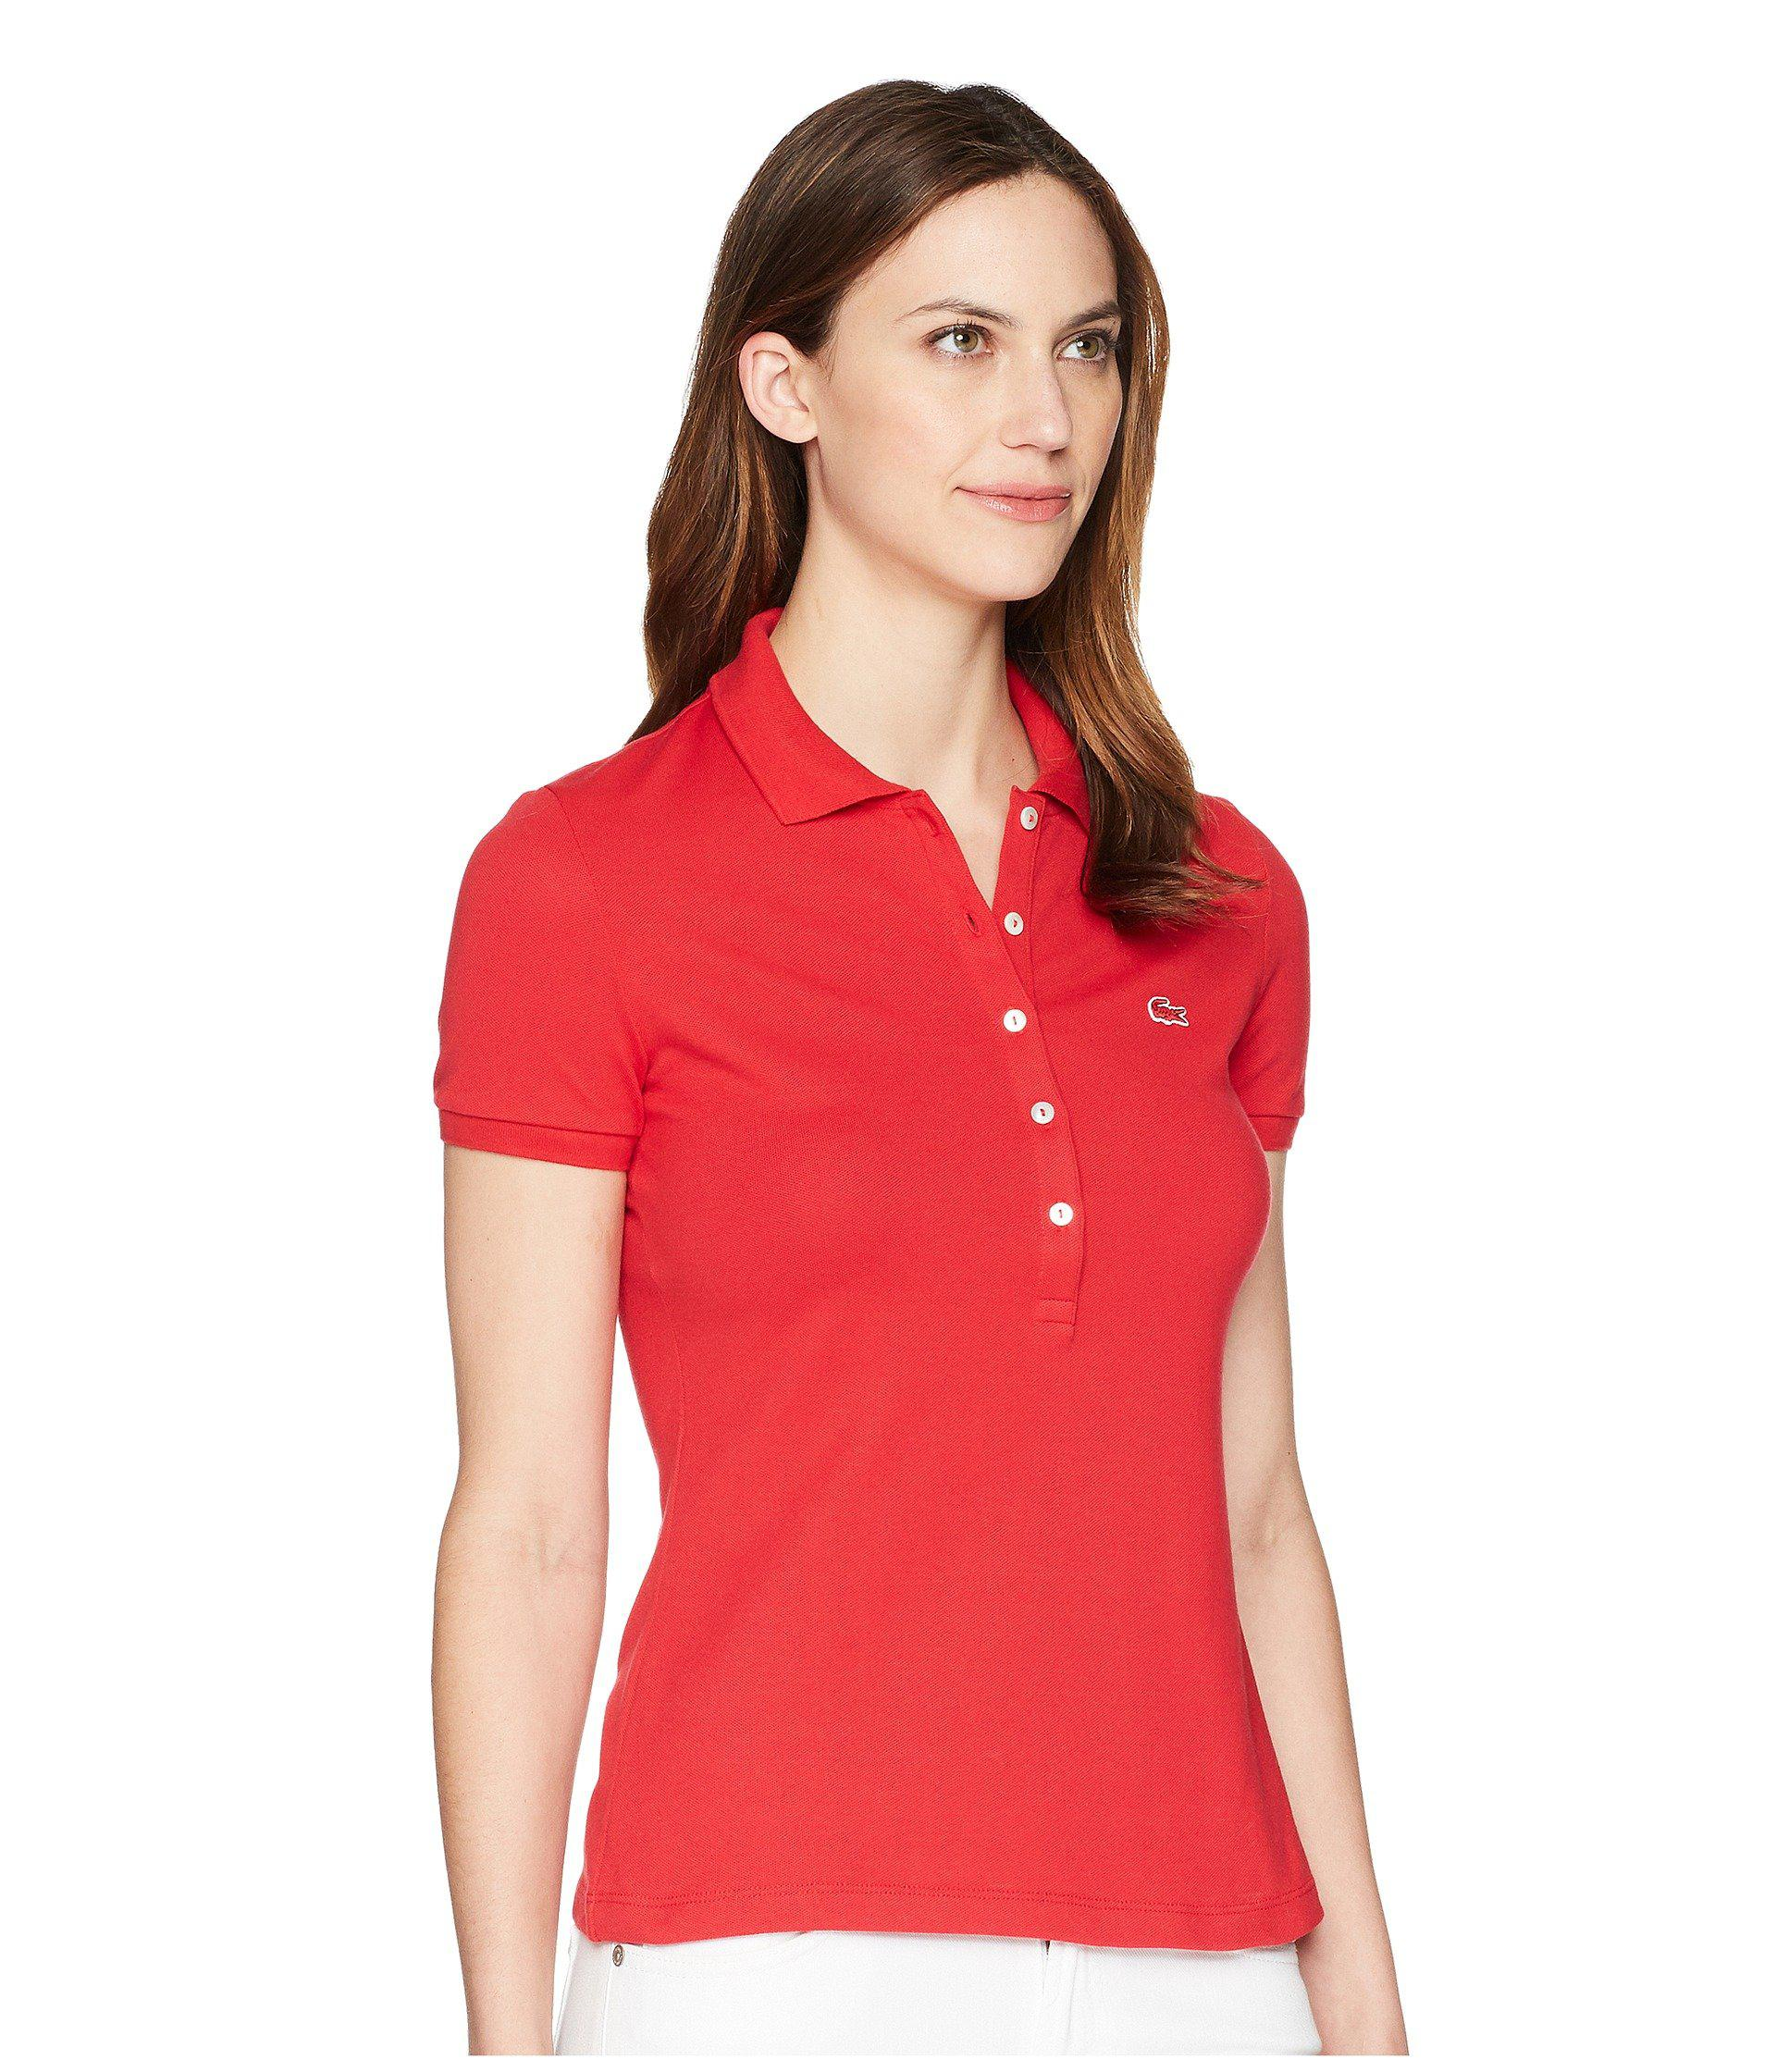 a5d506fe Lacoste Womens Polo Shirts On Sale - DREAMWORKS